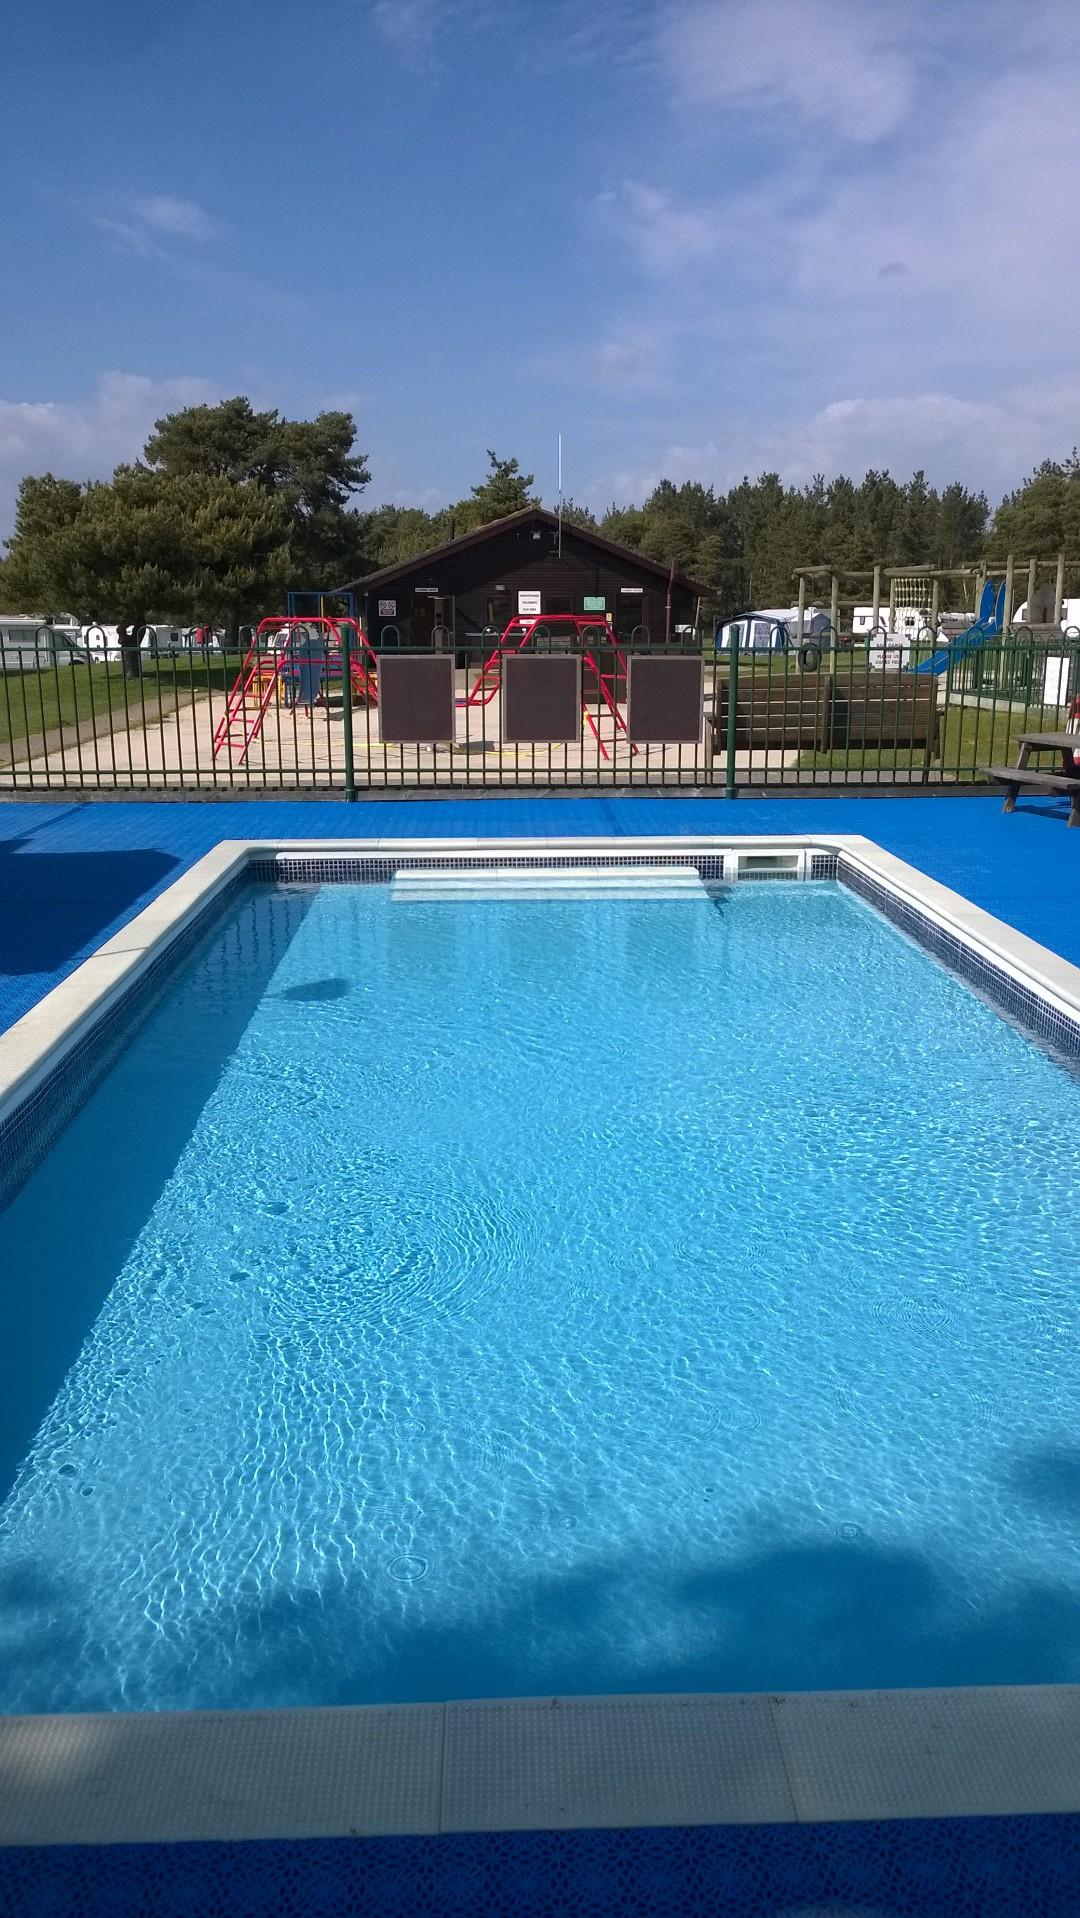 Children's Paddling Pool 2 feet deep